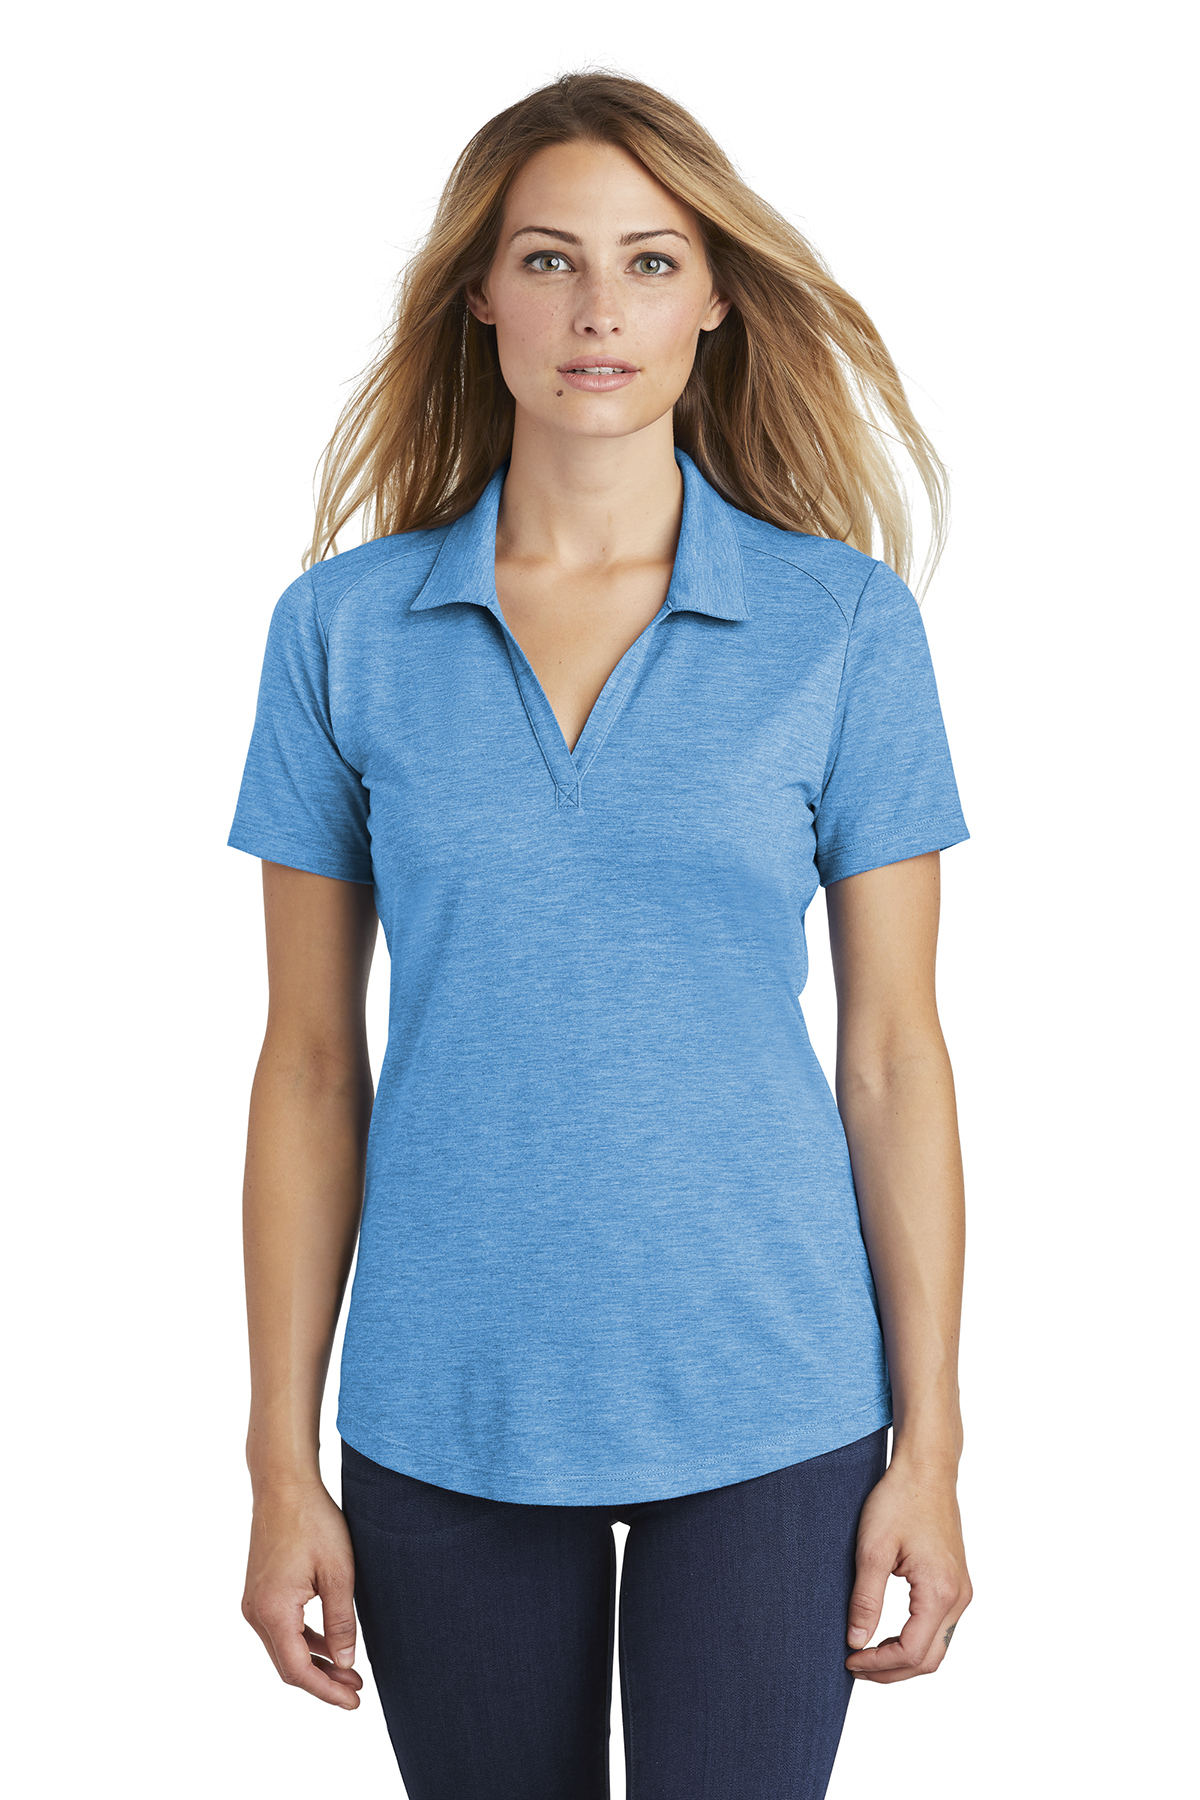 f5e51c00 Sport-Tek ® Ladies PosiCharge ® Tri-Blend Wicking Polo | Polos/Knits ...